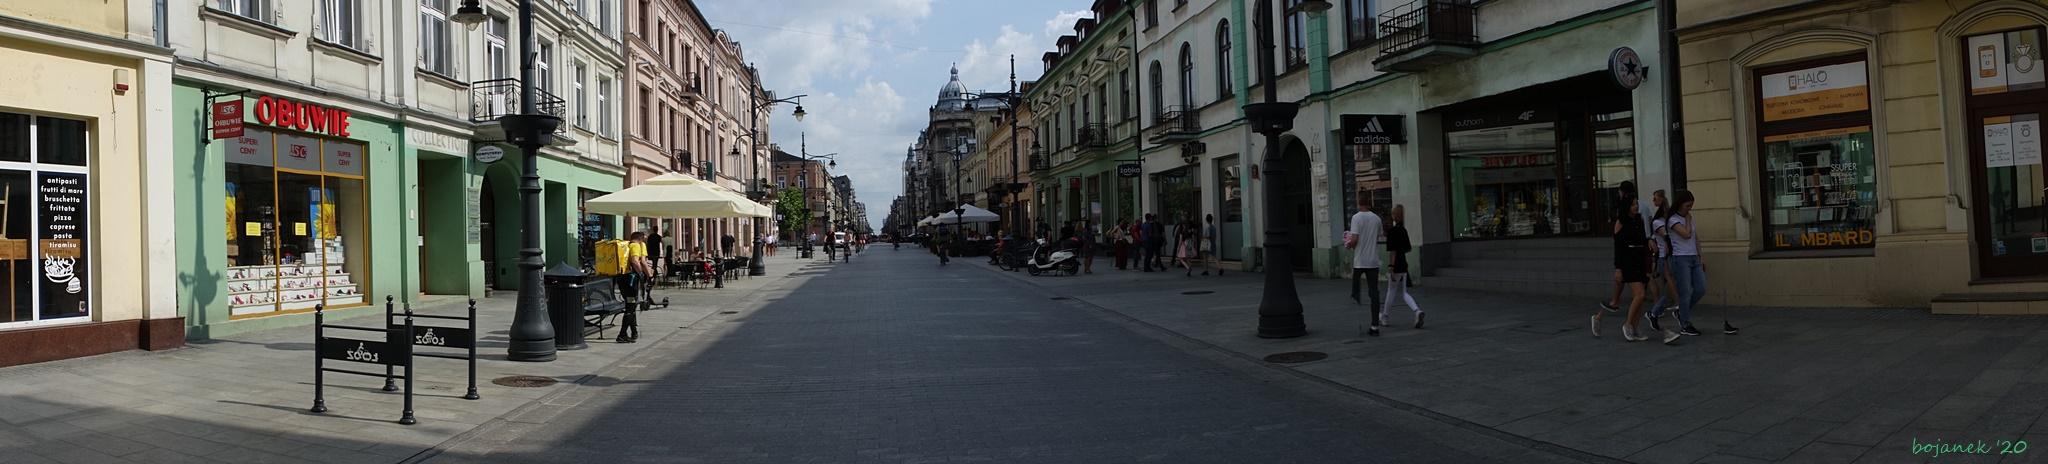 Piotrkowska 16